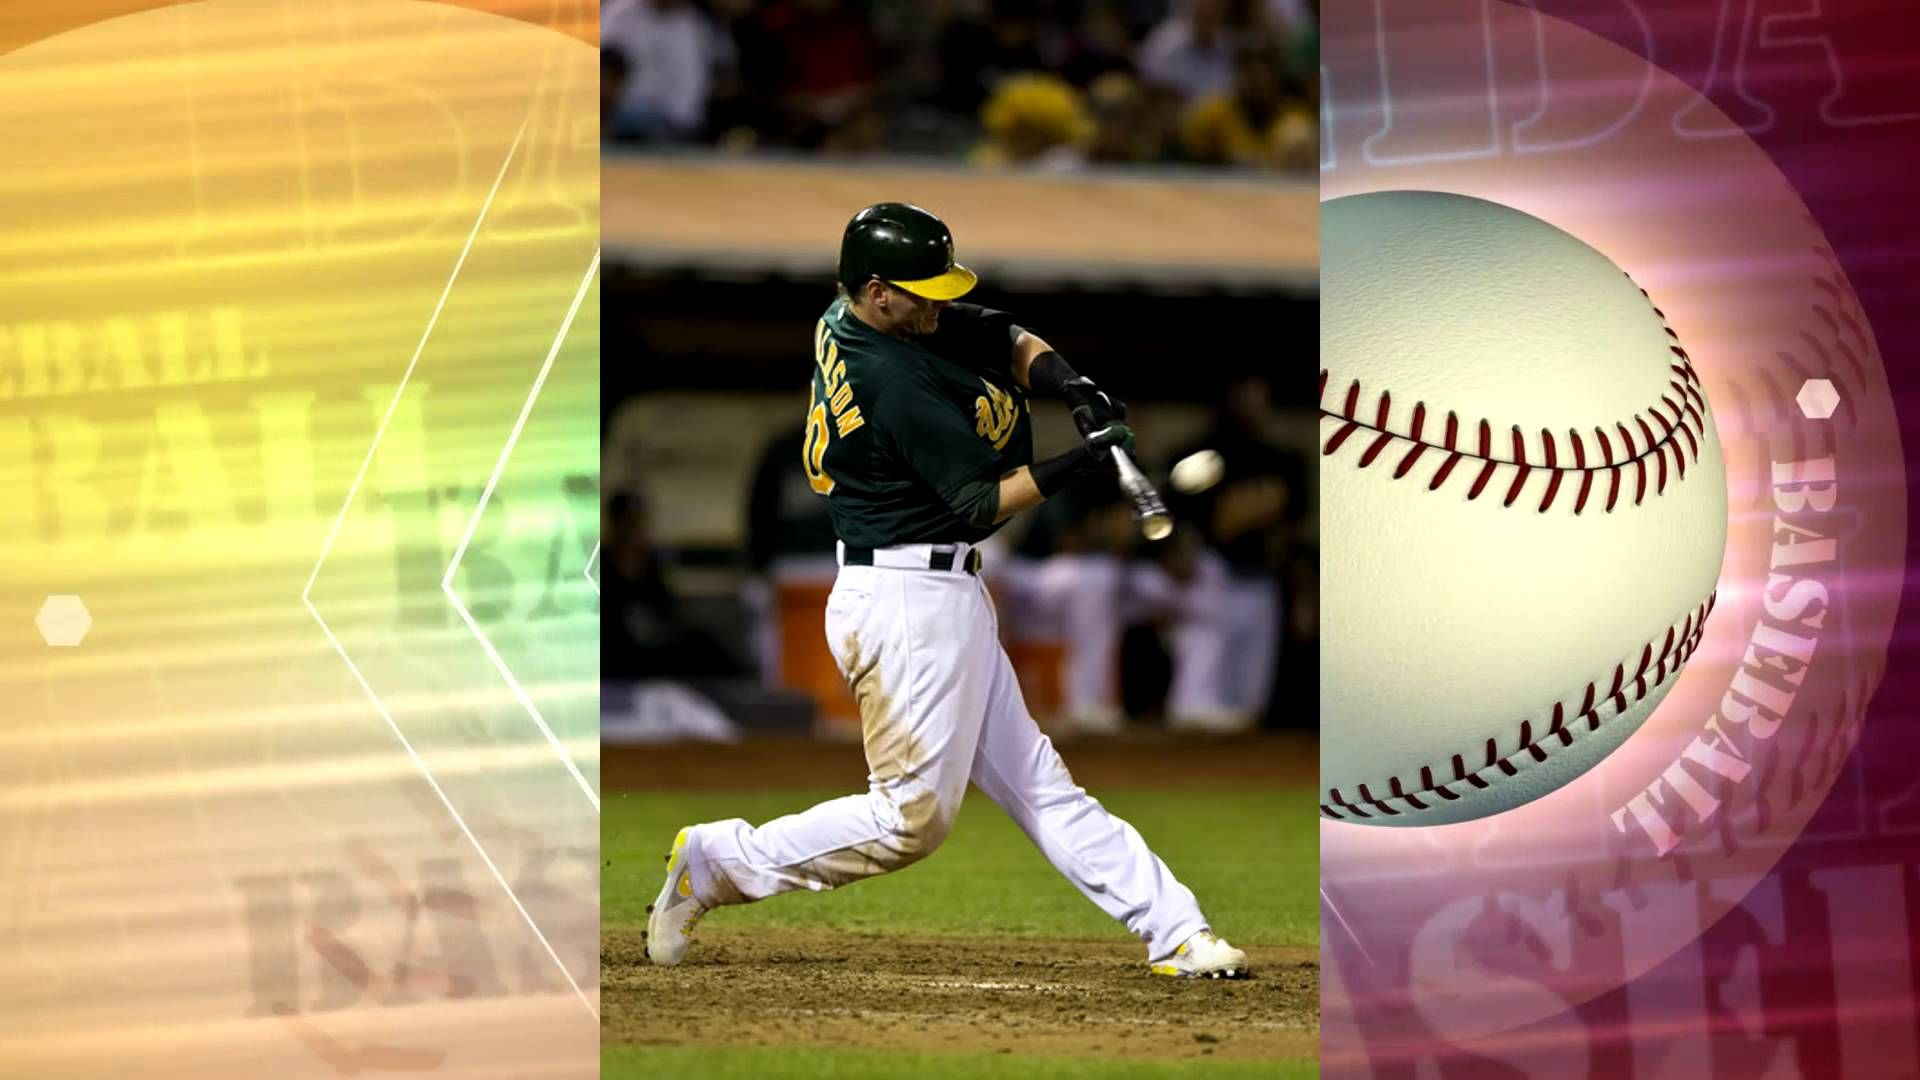 25 things Josh Donaldson taught me about Hitting